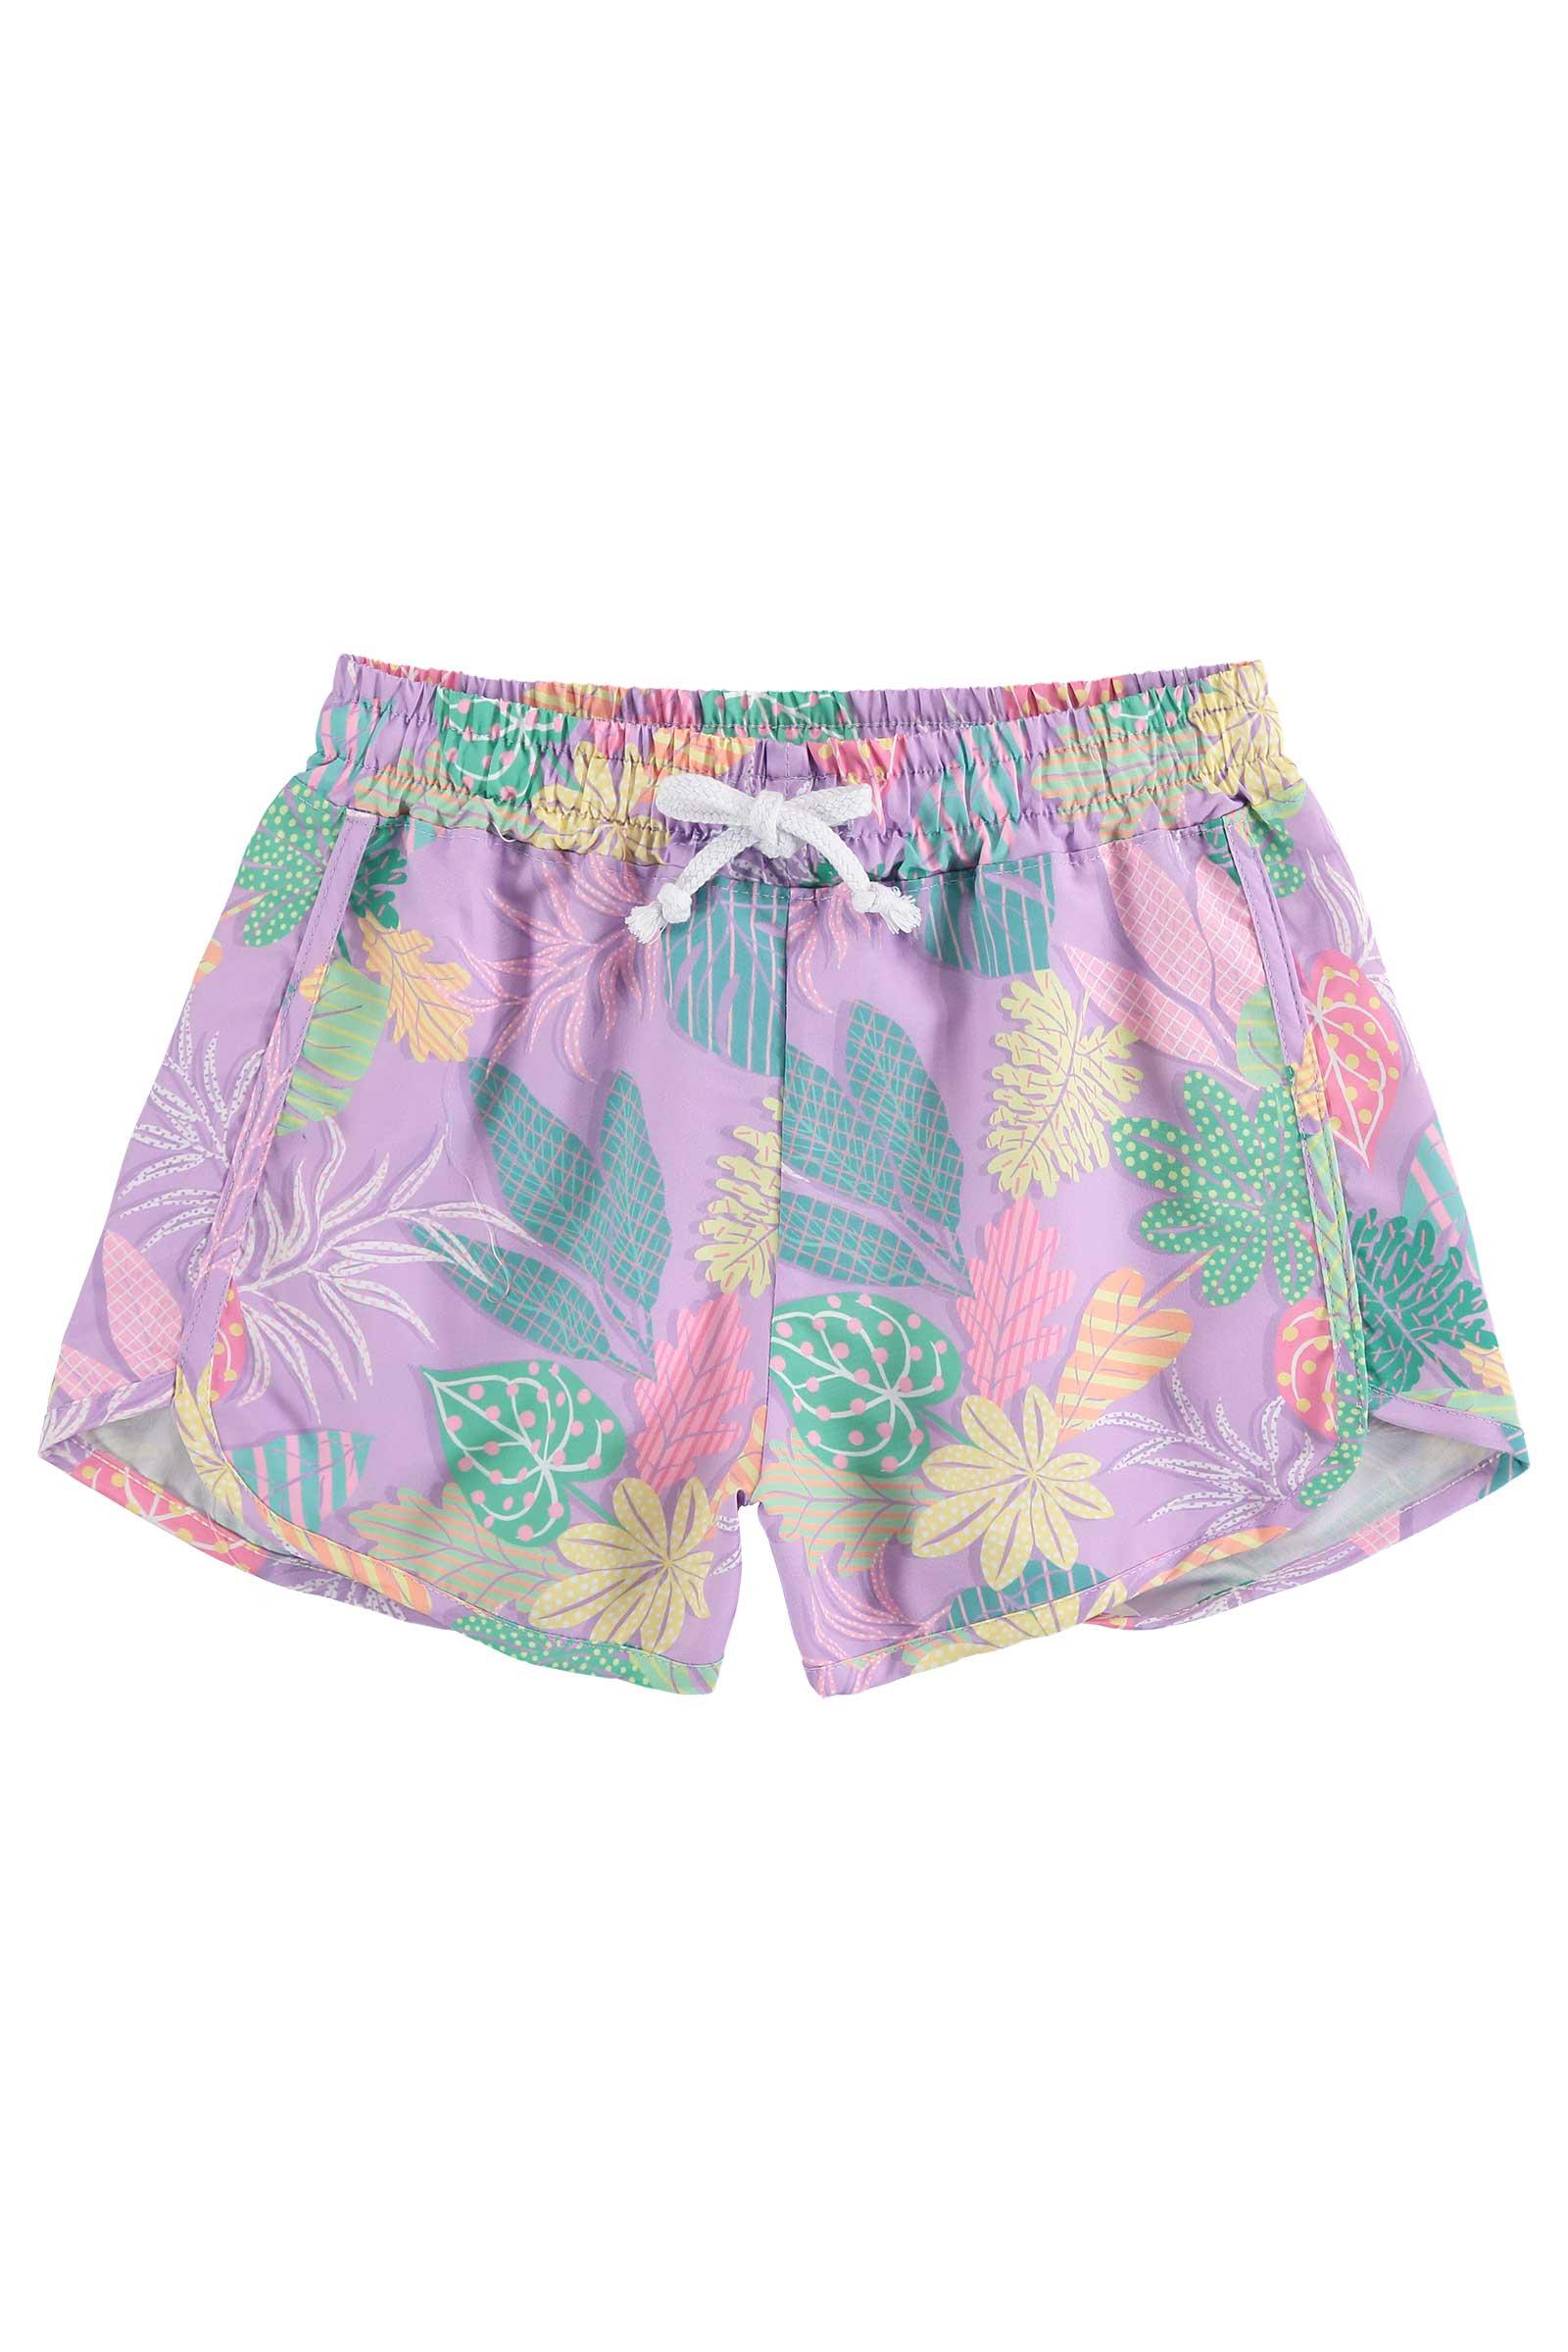 Shorts Infantil Lilimoon Lilas